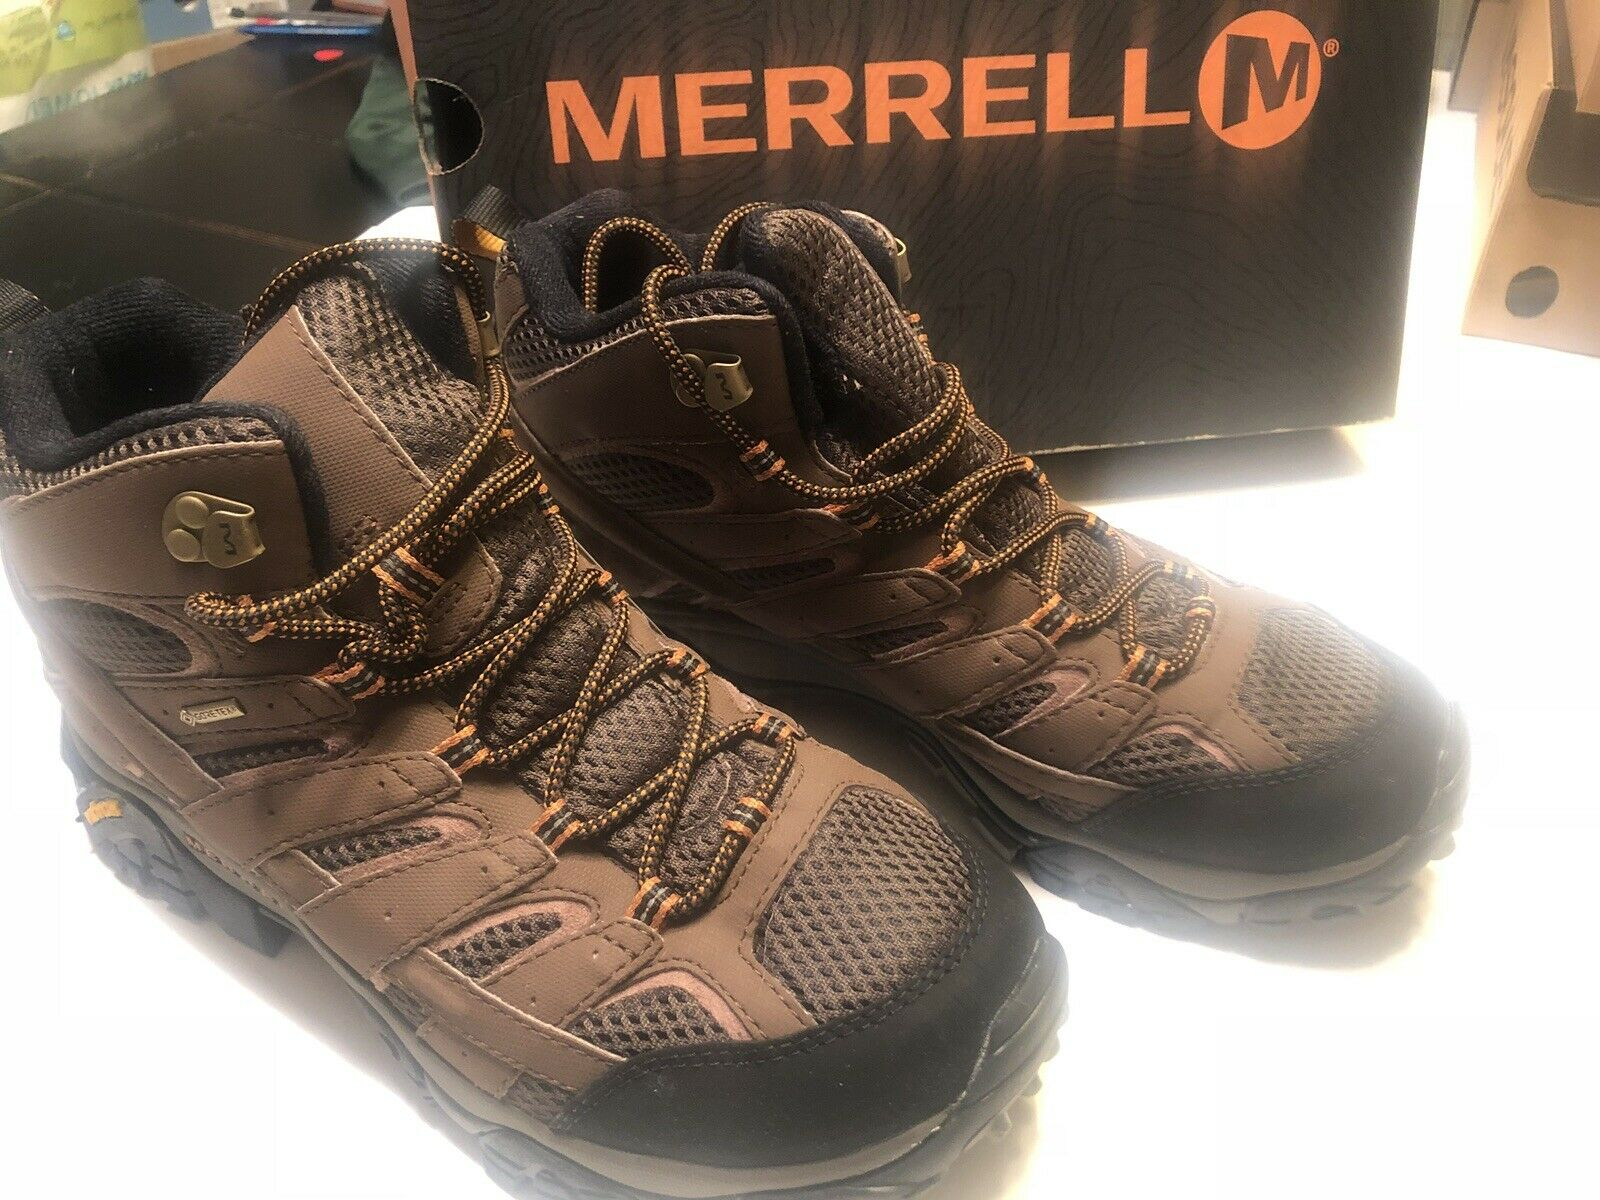 Merrell Moab 2 Mid GTX uomini's 9 Earth